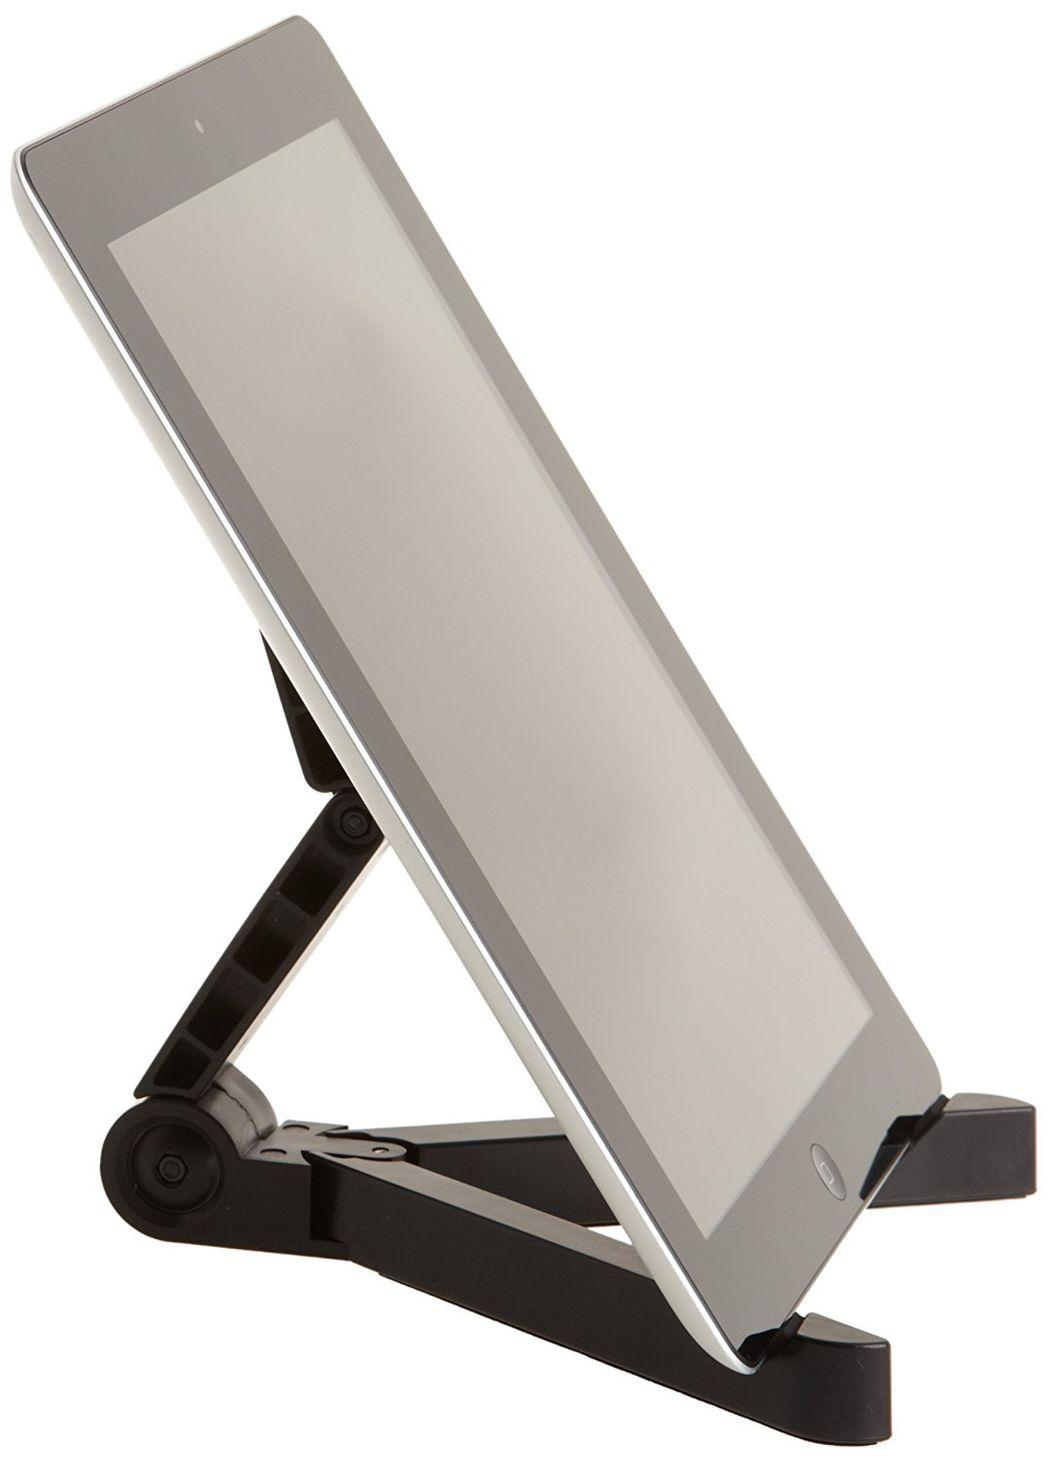 Amazon Basics Adjustable Gadget Stand